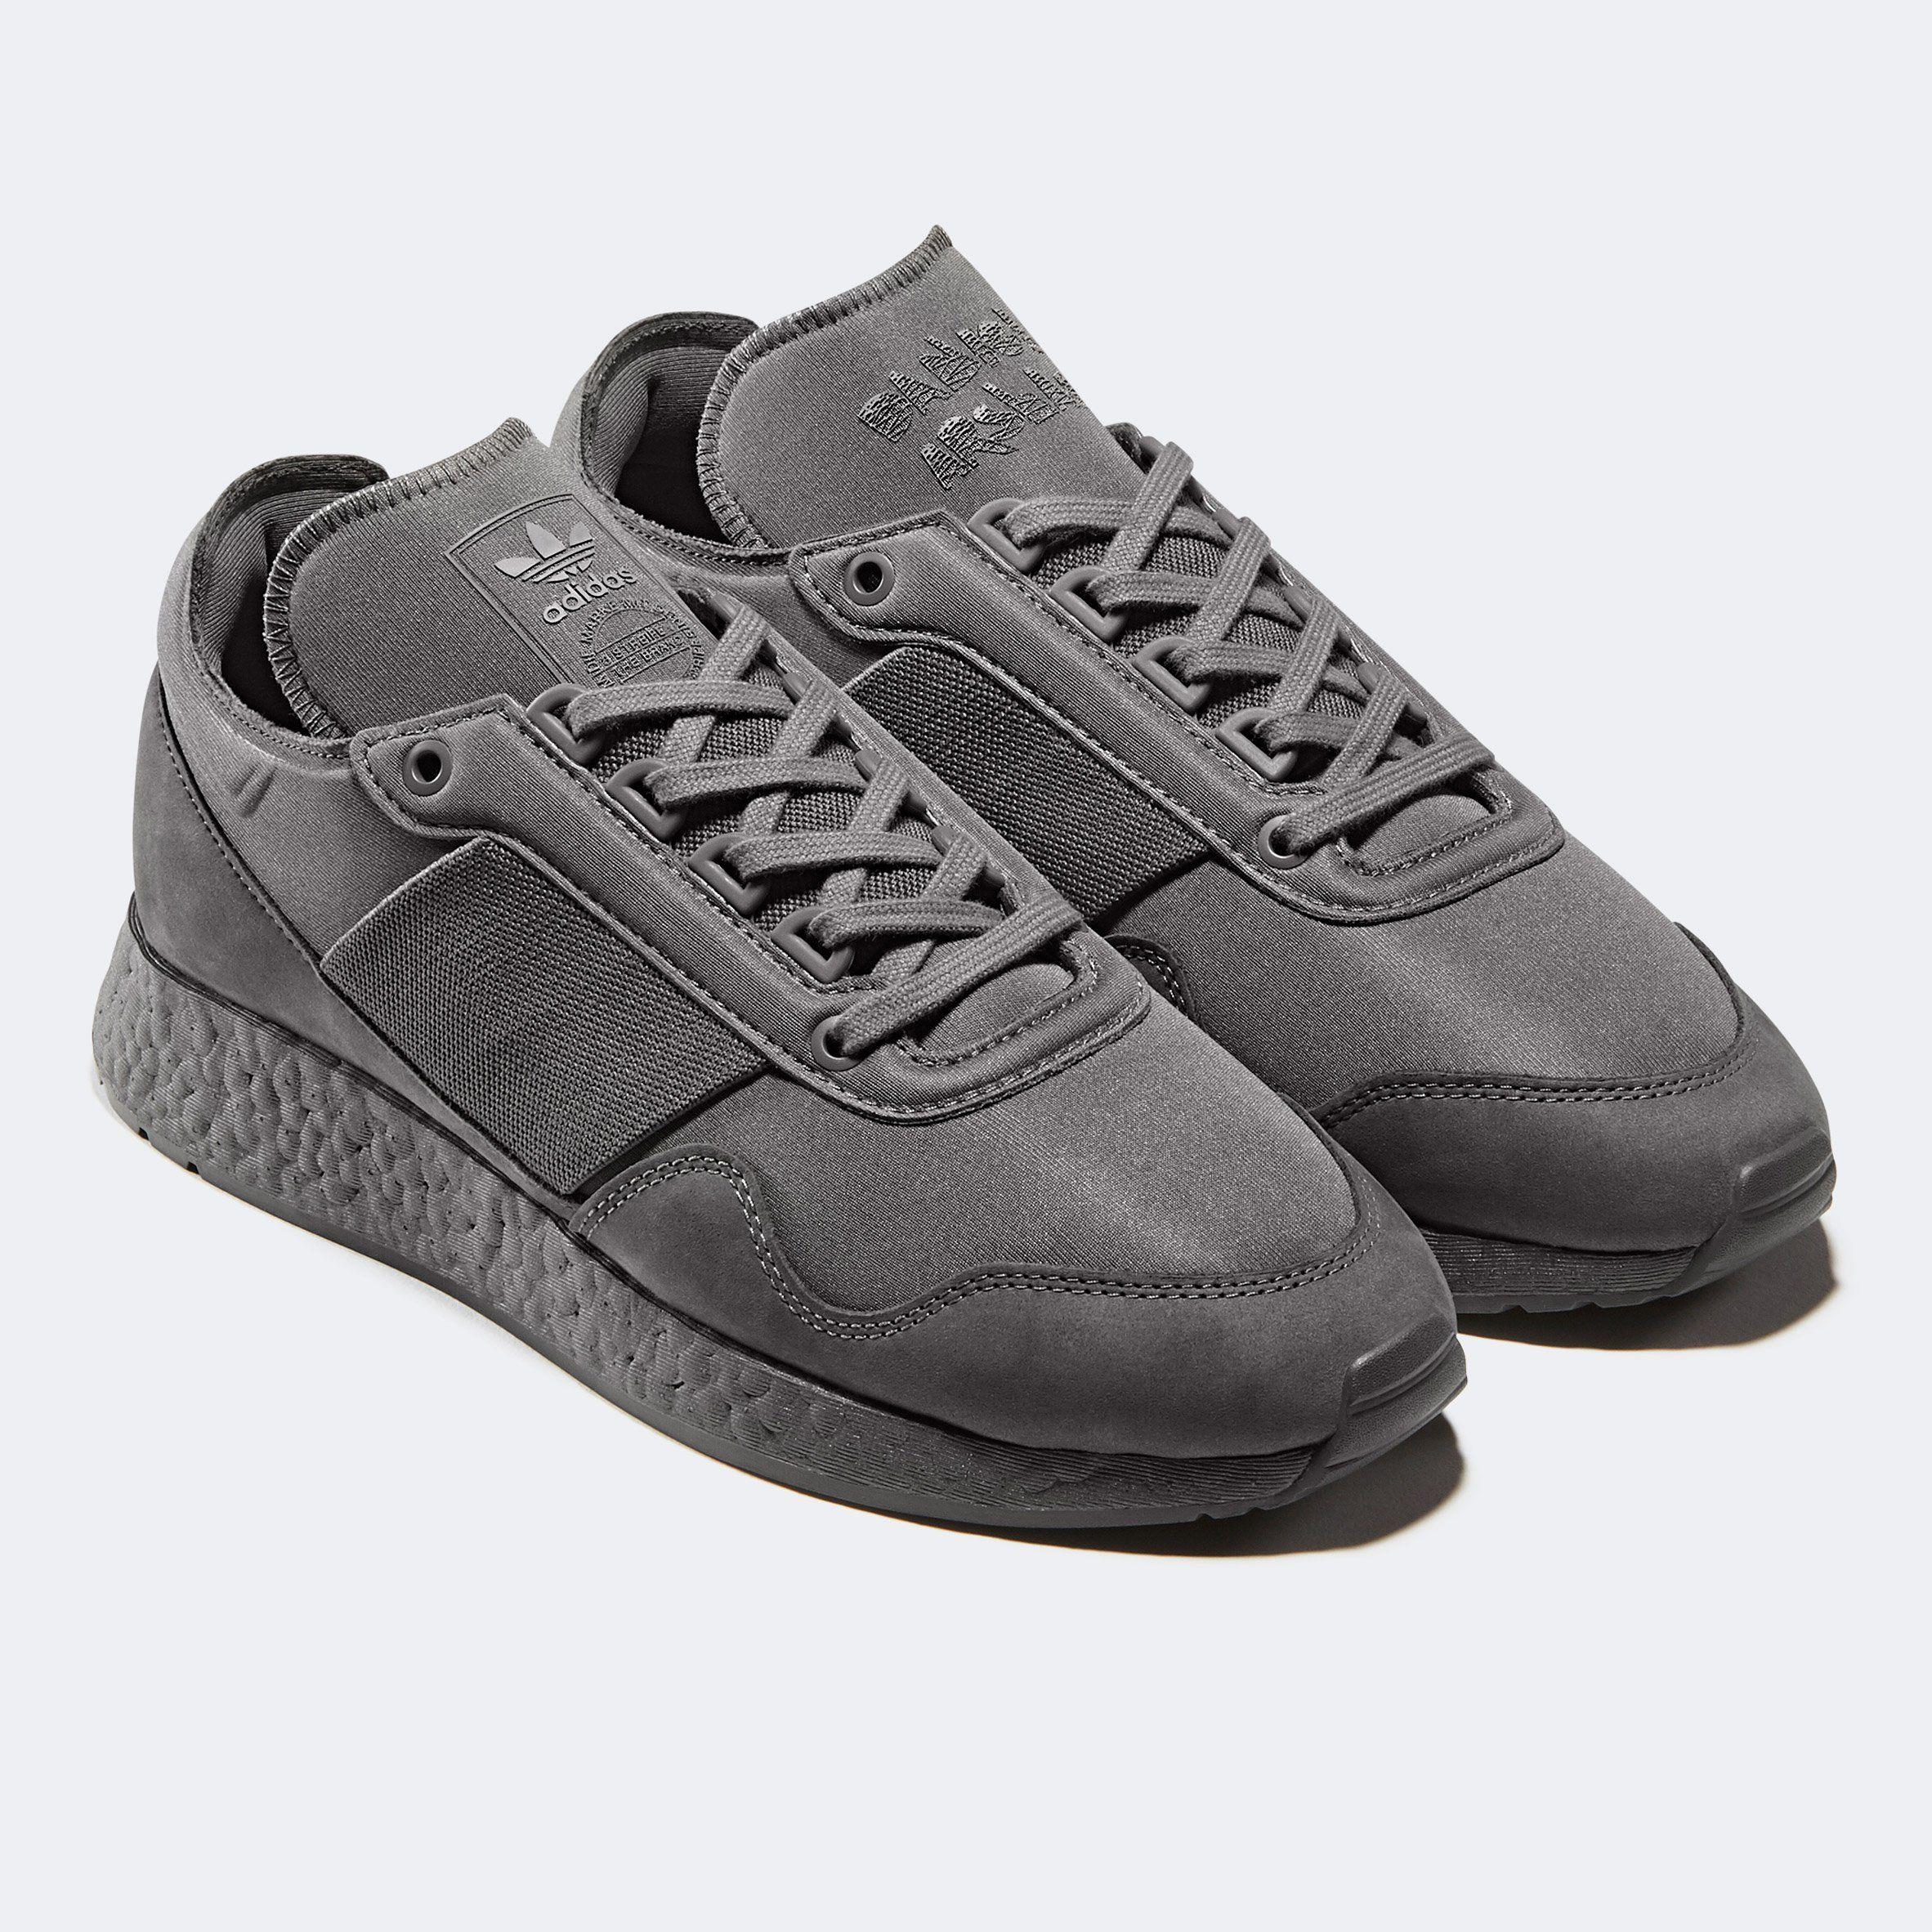 Damen Sneaker Textil NIKE Aptare Special Edition Sneaker